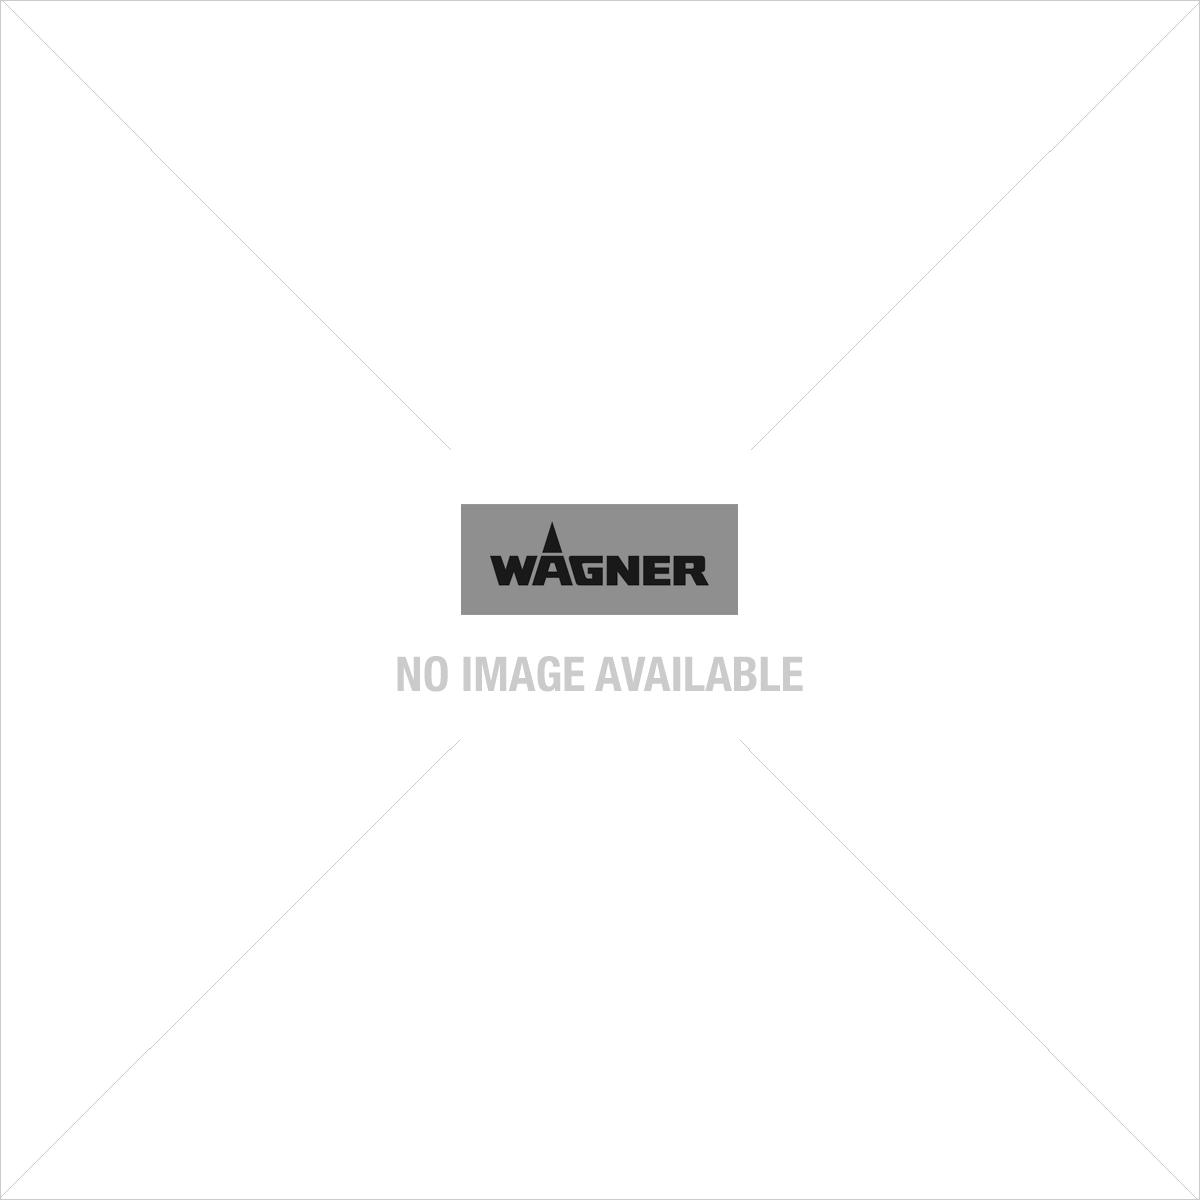 Wagner W 16 behangafstomer